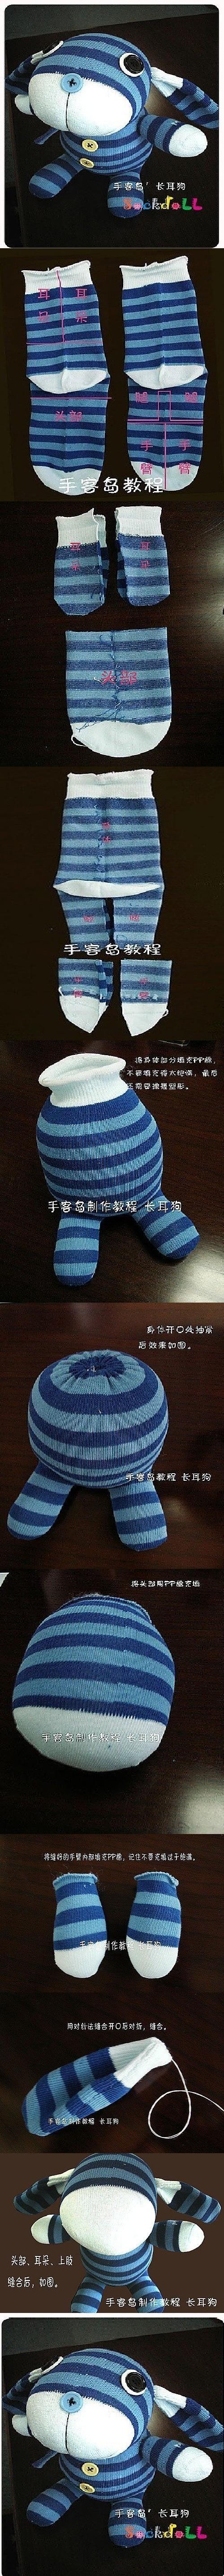 Sock doll